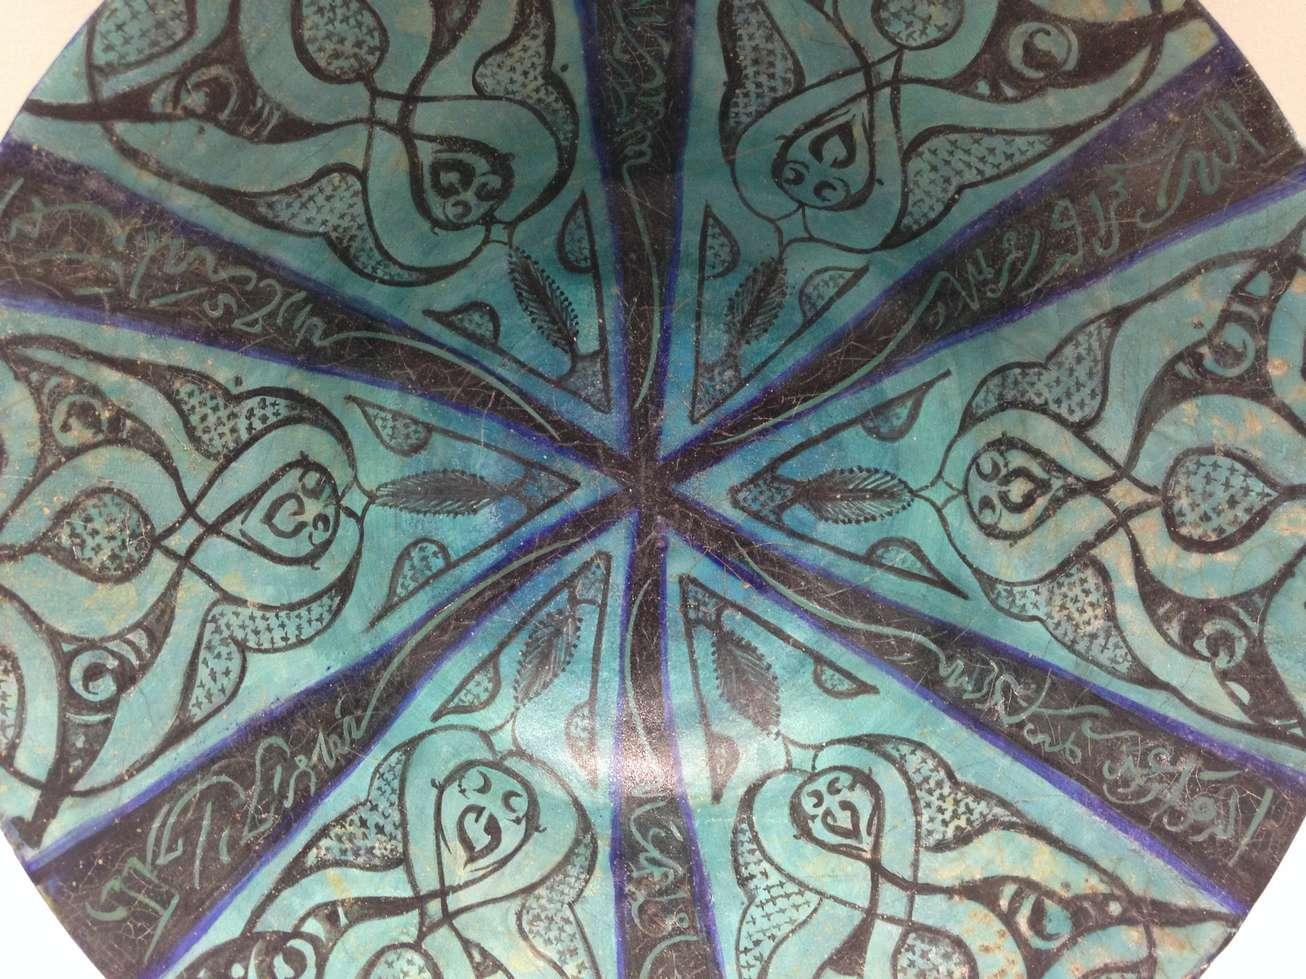 collection-towhidi-tabari-art-perse-saljuqide-seldjoukide-restaurarte.jpg